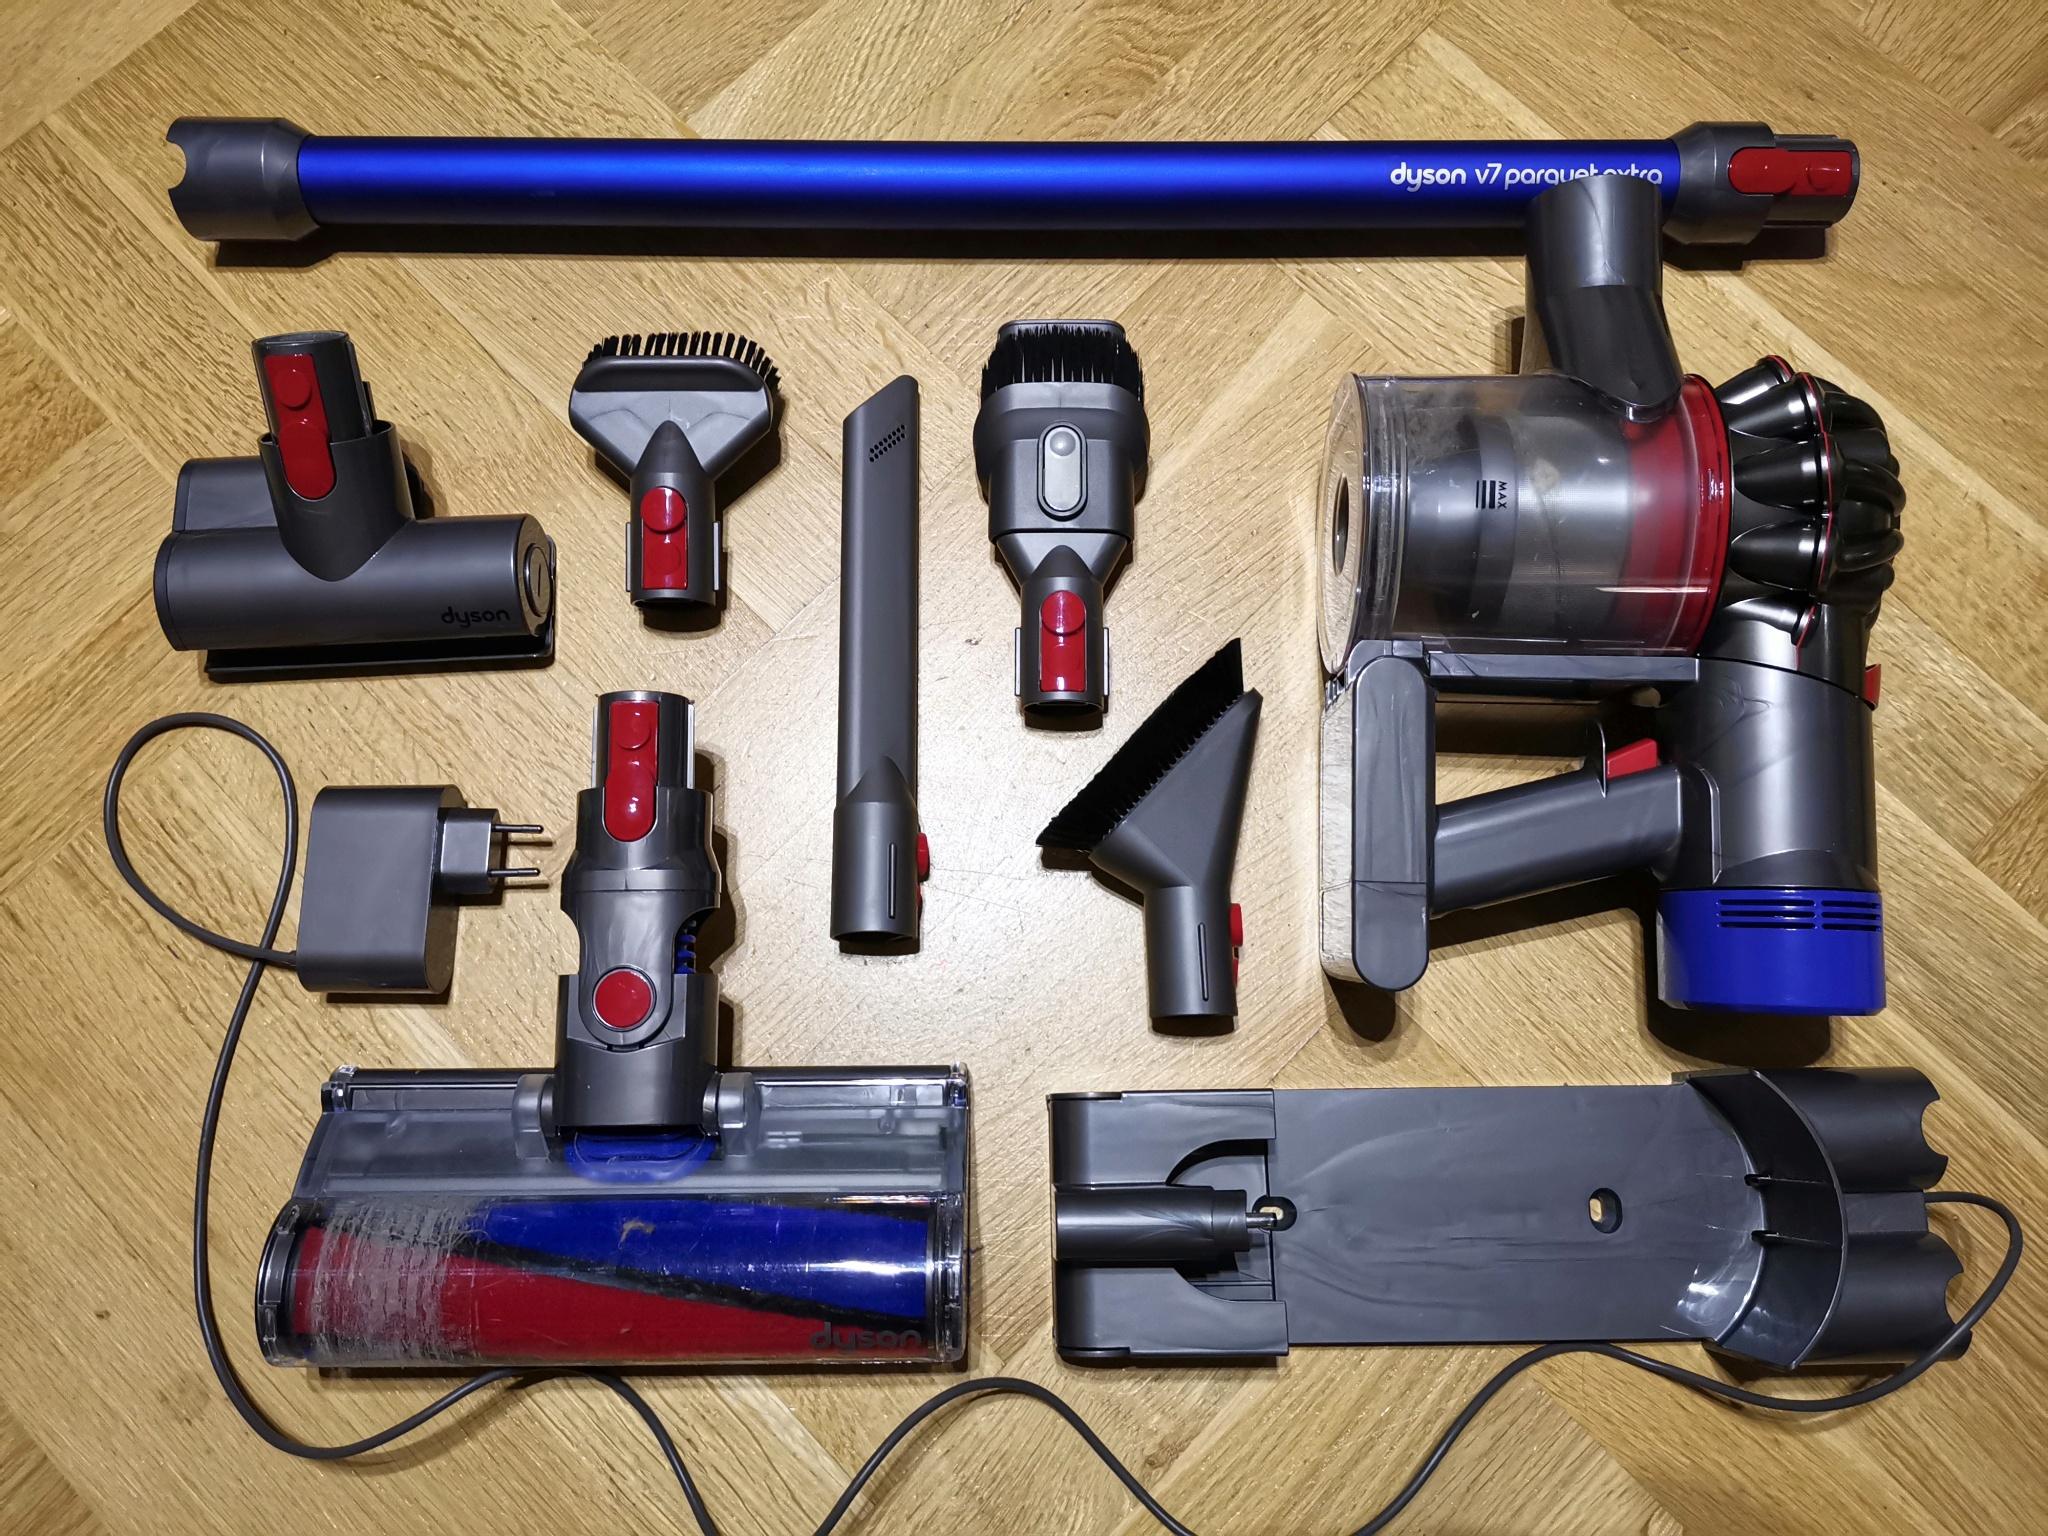 Dyson v7 reviews dyson vacuum cleaners dc59